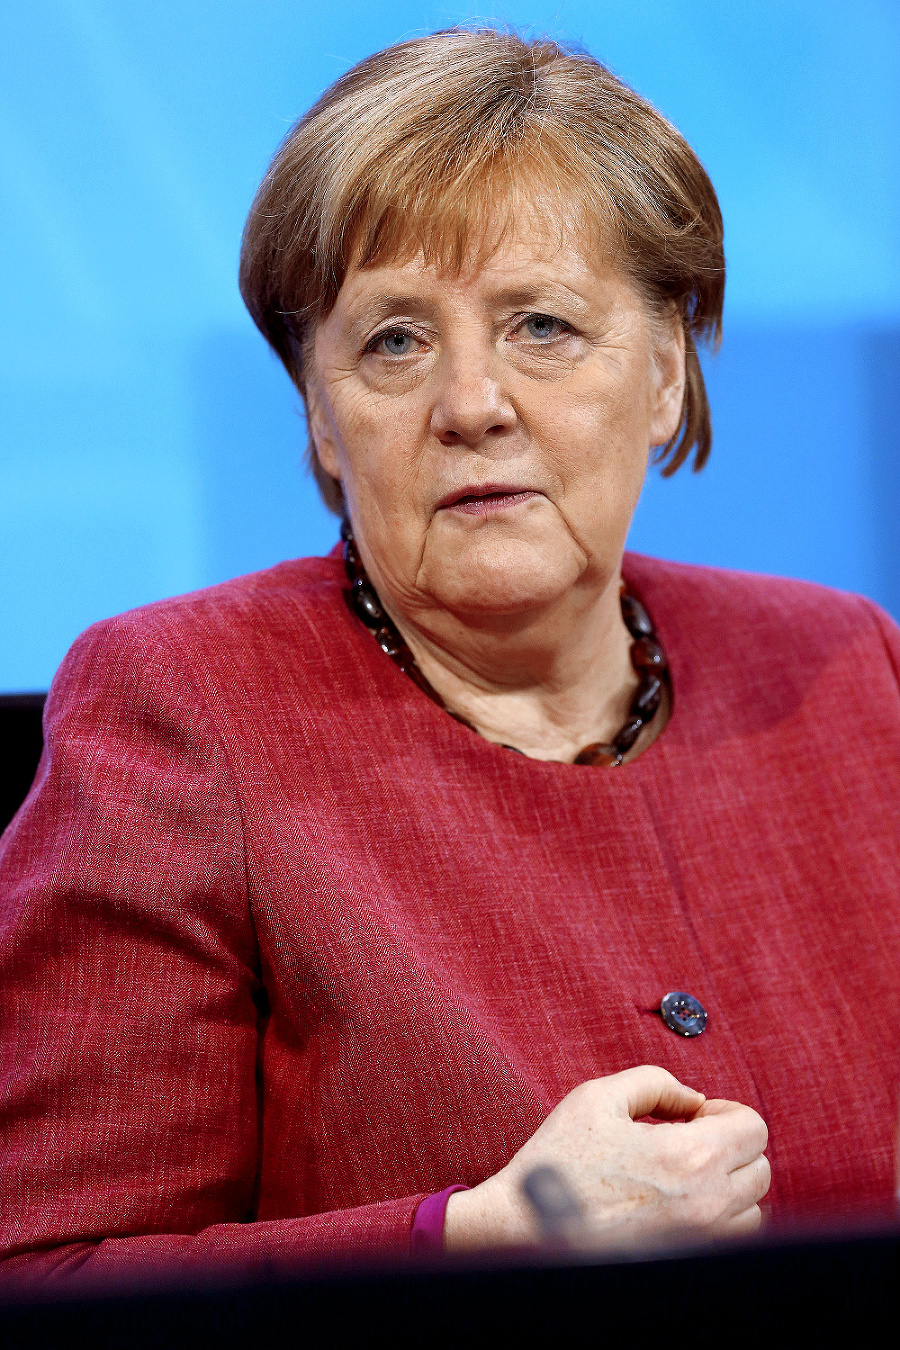 Angela Merkel (66)